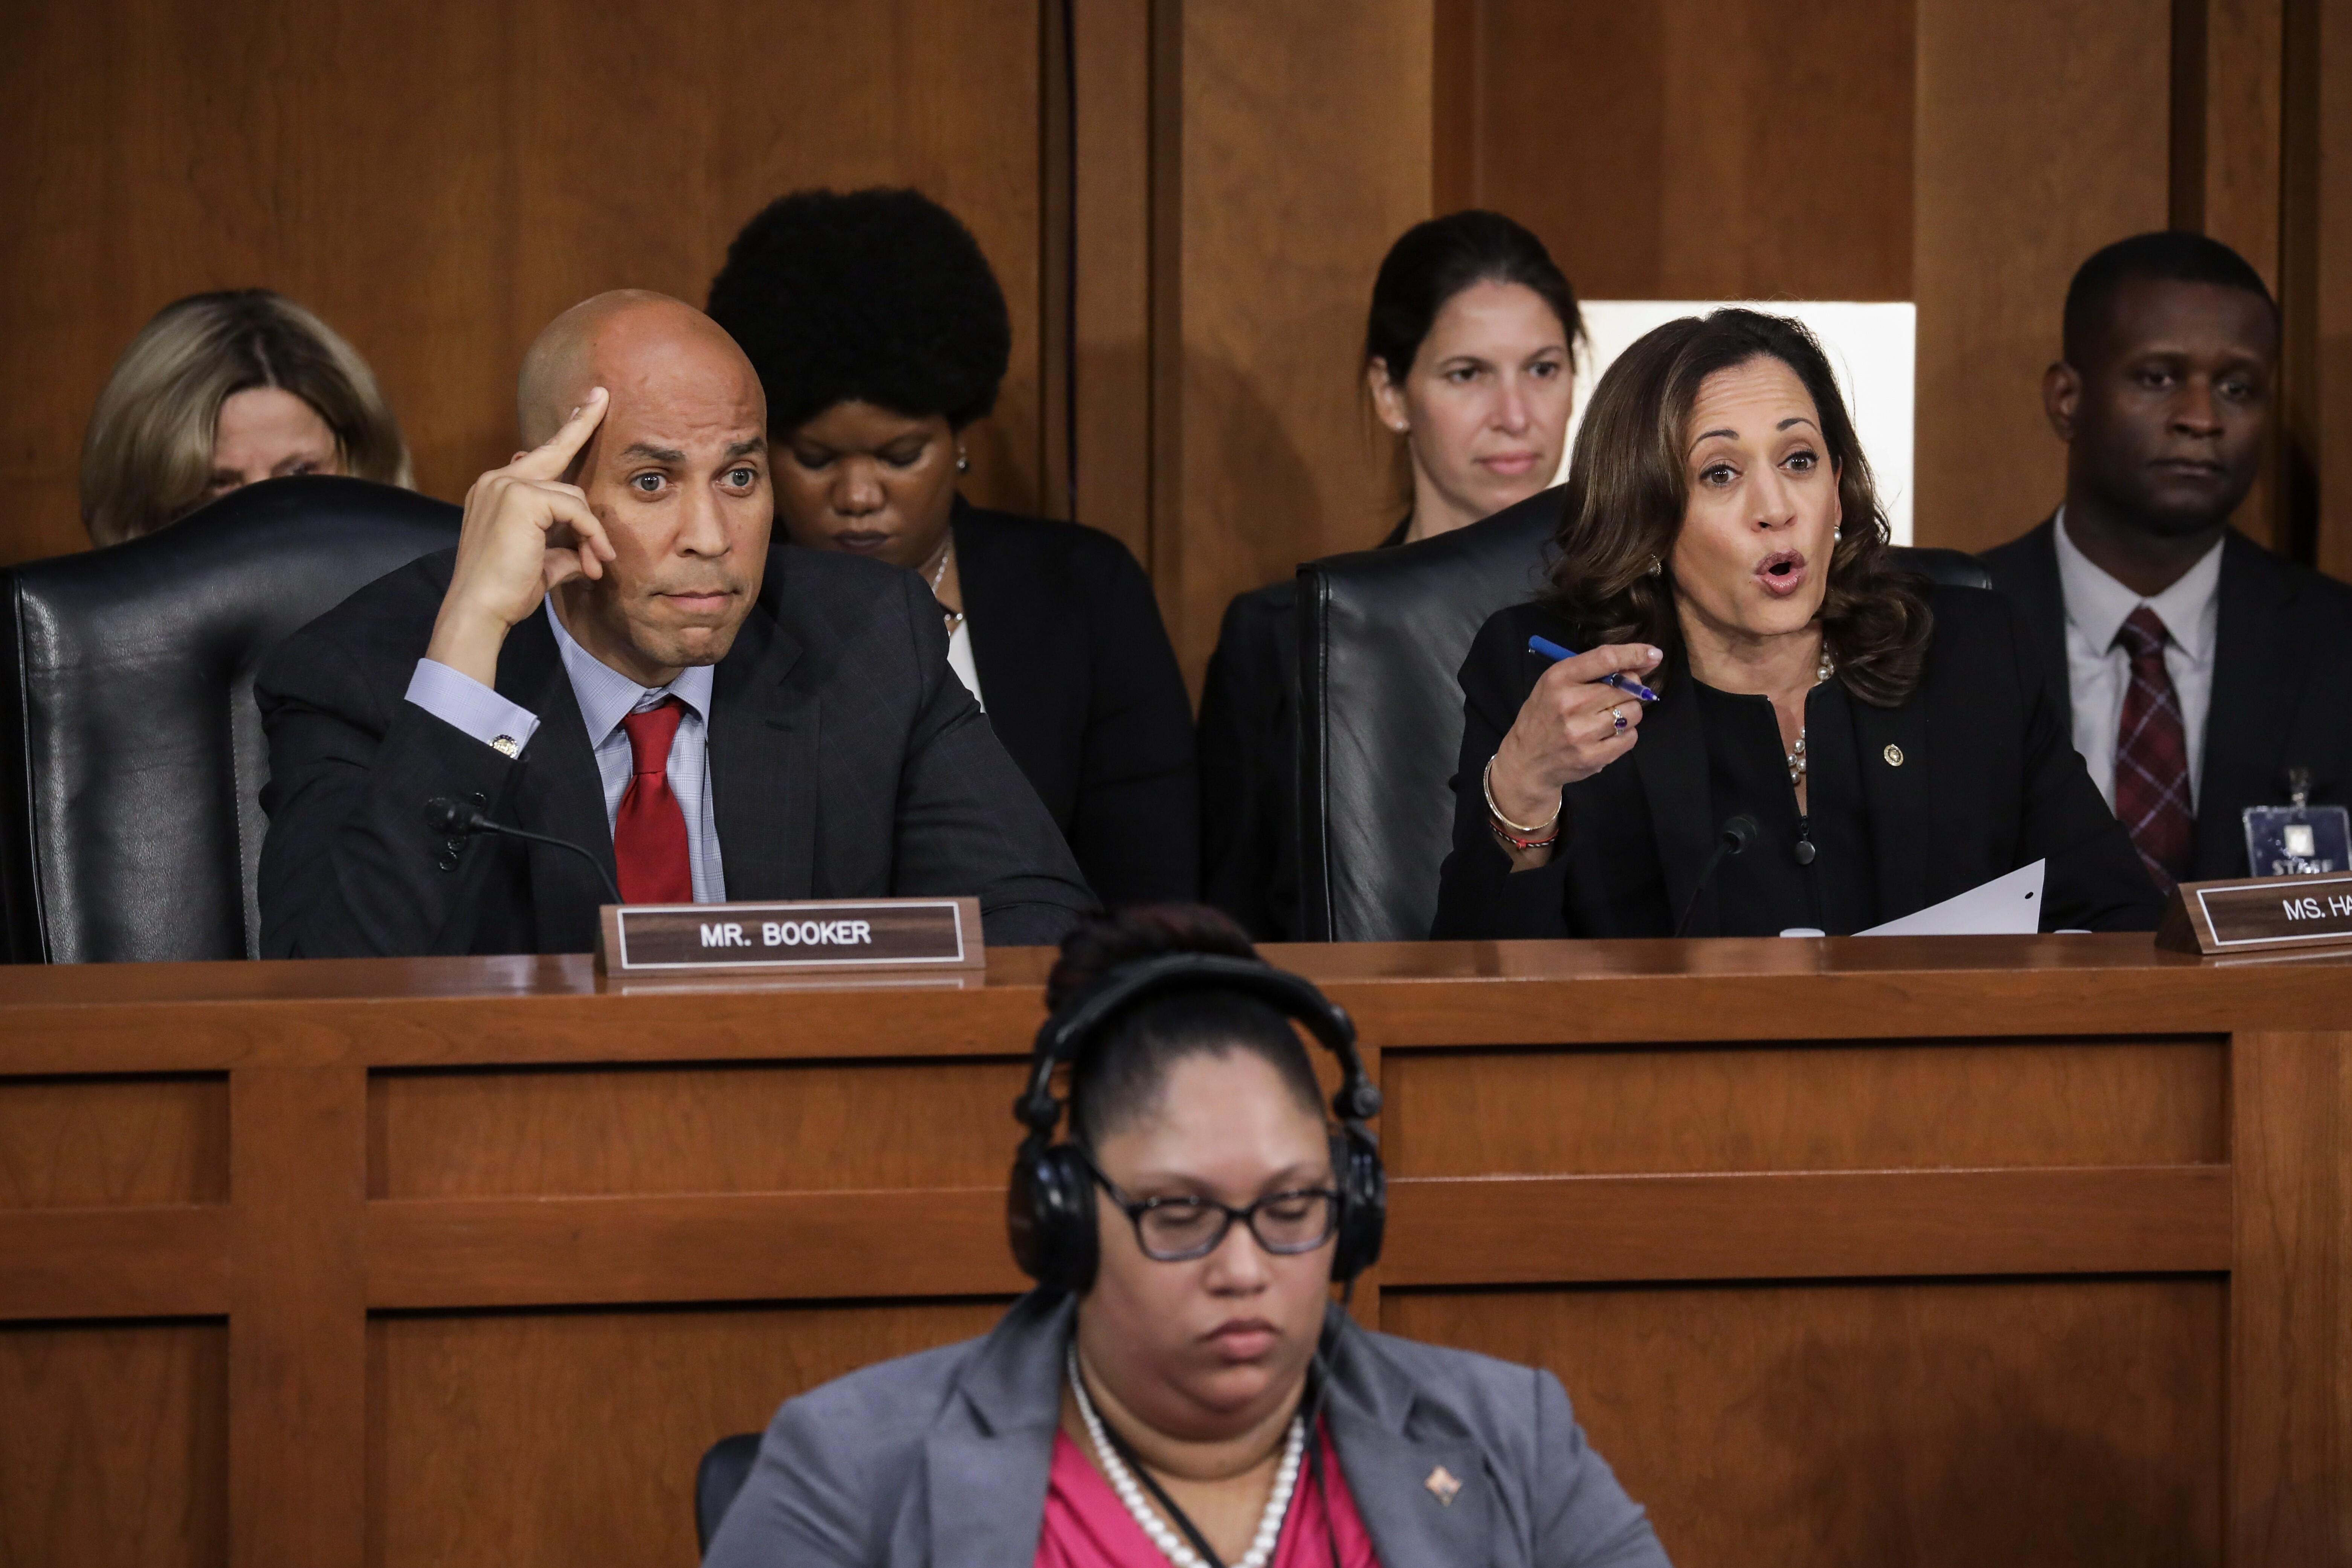 democrats behaving badly